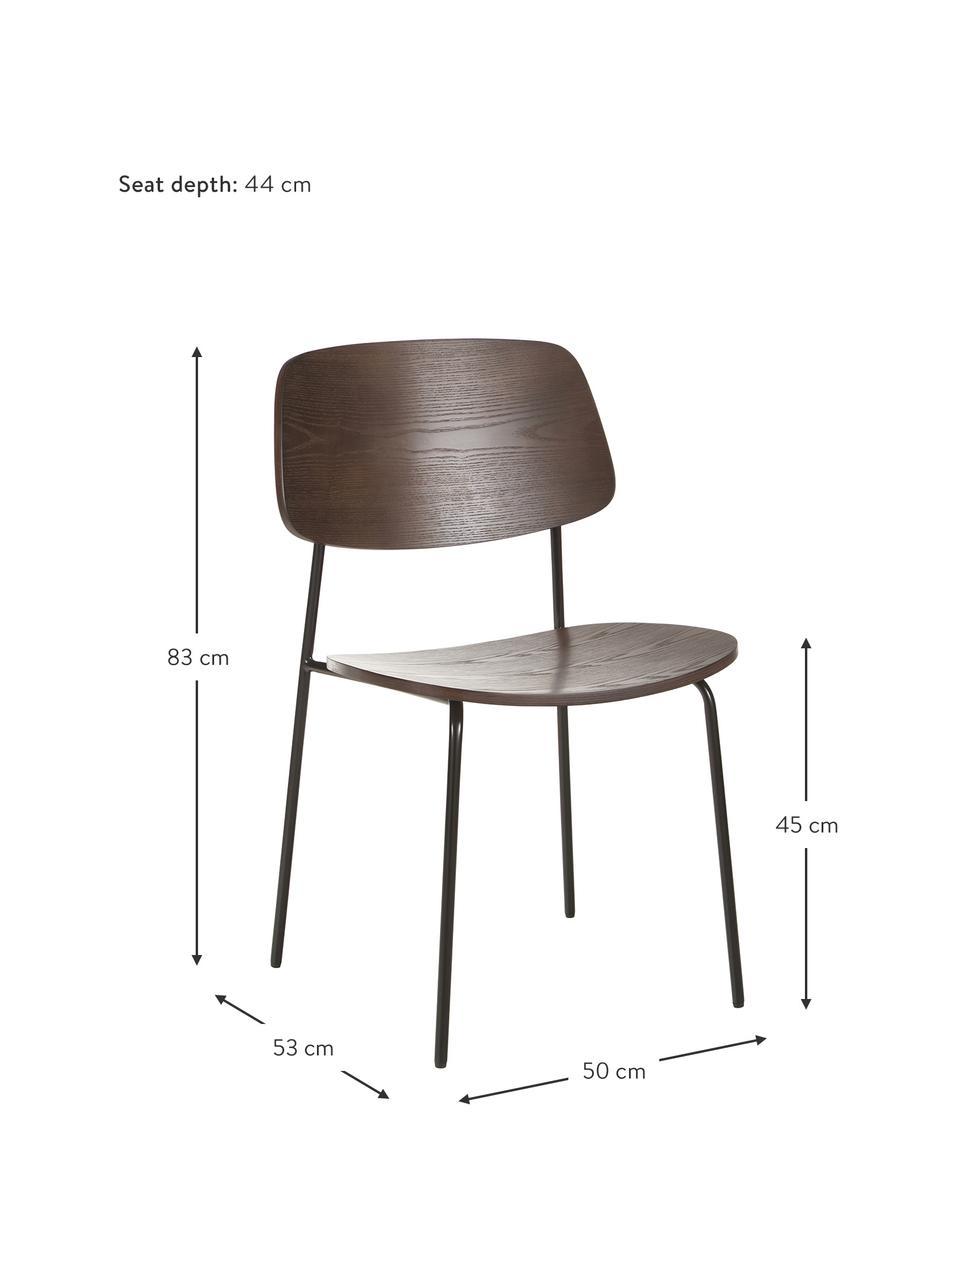 Holzstühle Nadja, 2 Stück, Sitzfläche: Sperrholz mit Eschenholzf, Beine: Metall, pulverbeschichtet, Dunkles Eschenholzfunier, B 50 x T 53 cm